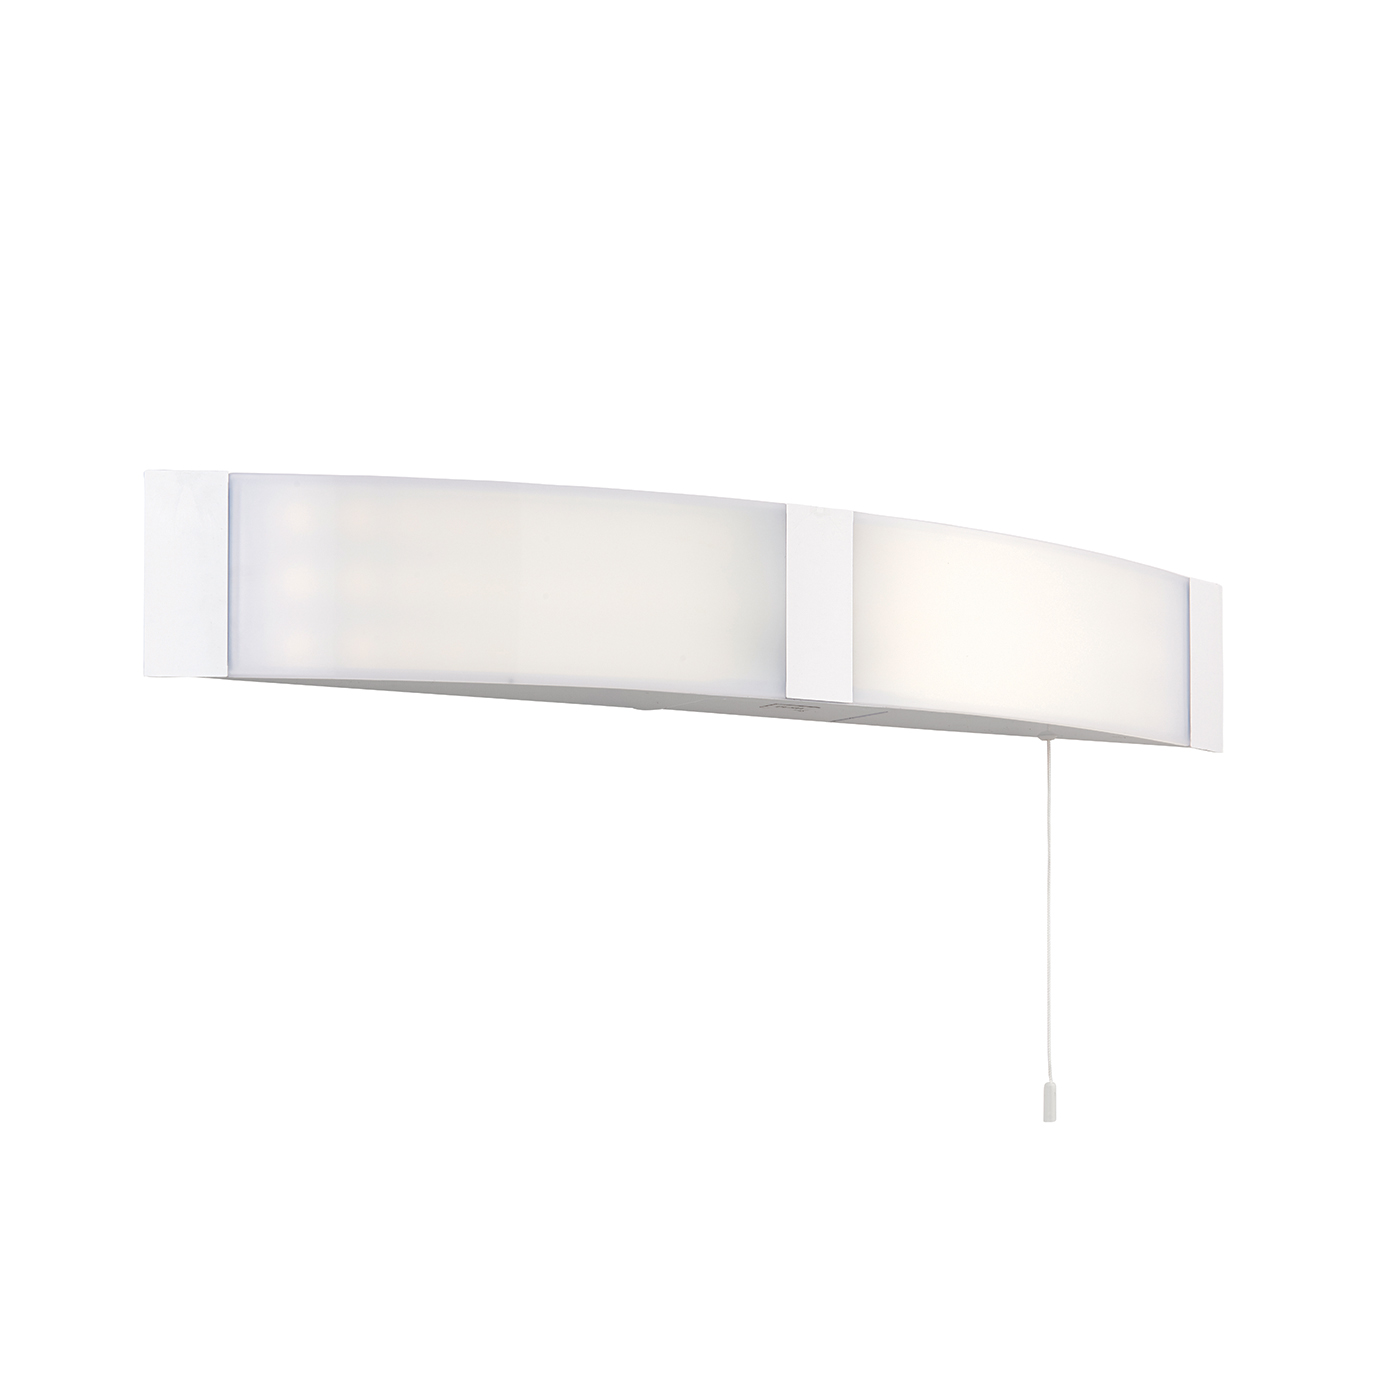 Endon onan bathroom led shaver light ip44 6w opal pc white acrylic endon onan bathroom led shaver light ip44 6w opal pc white acrylic pull cord aloadofball Choice Image